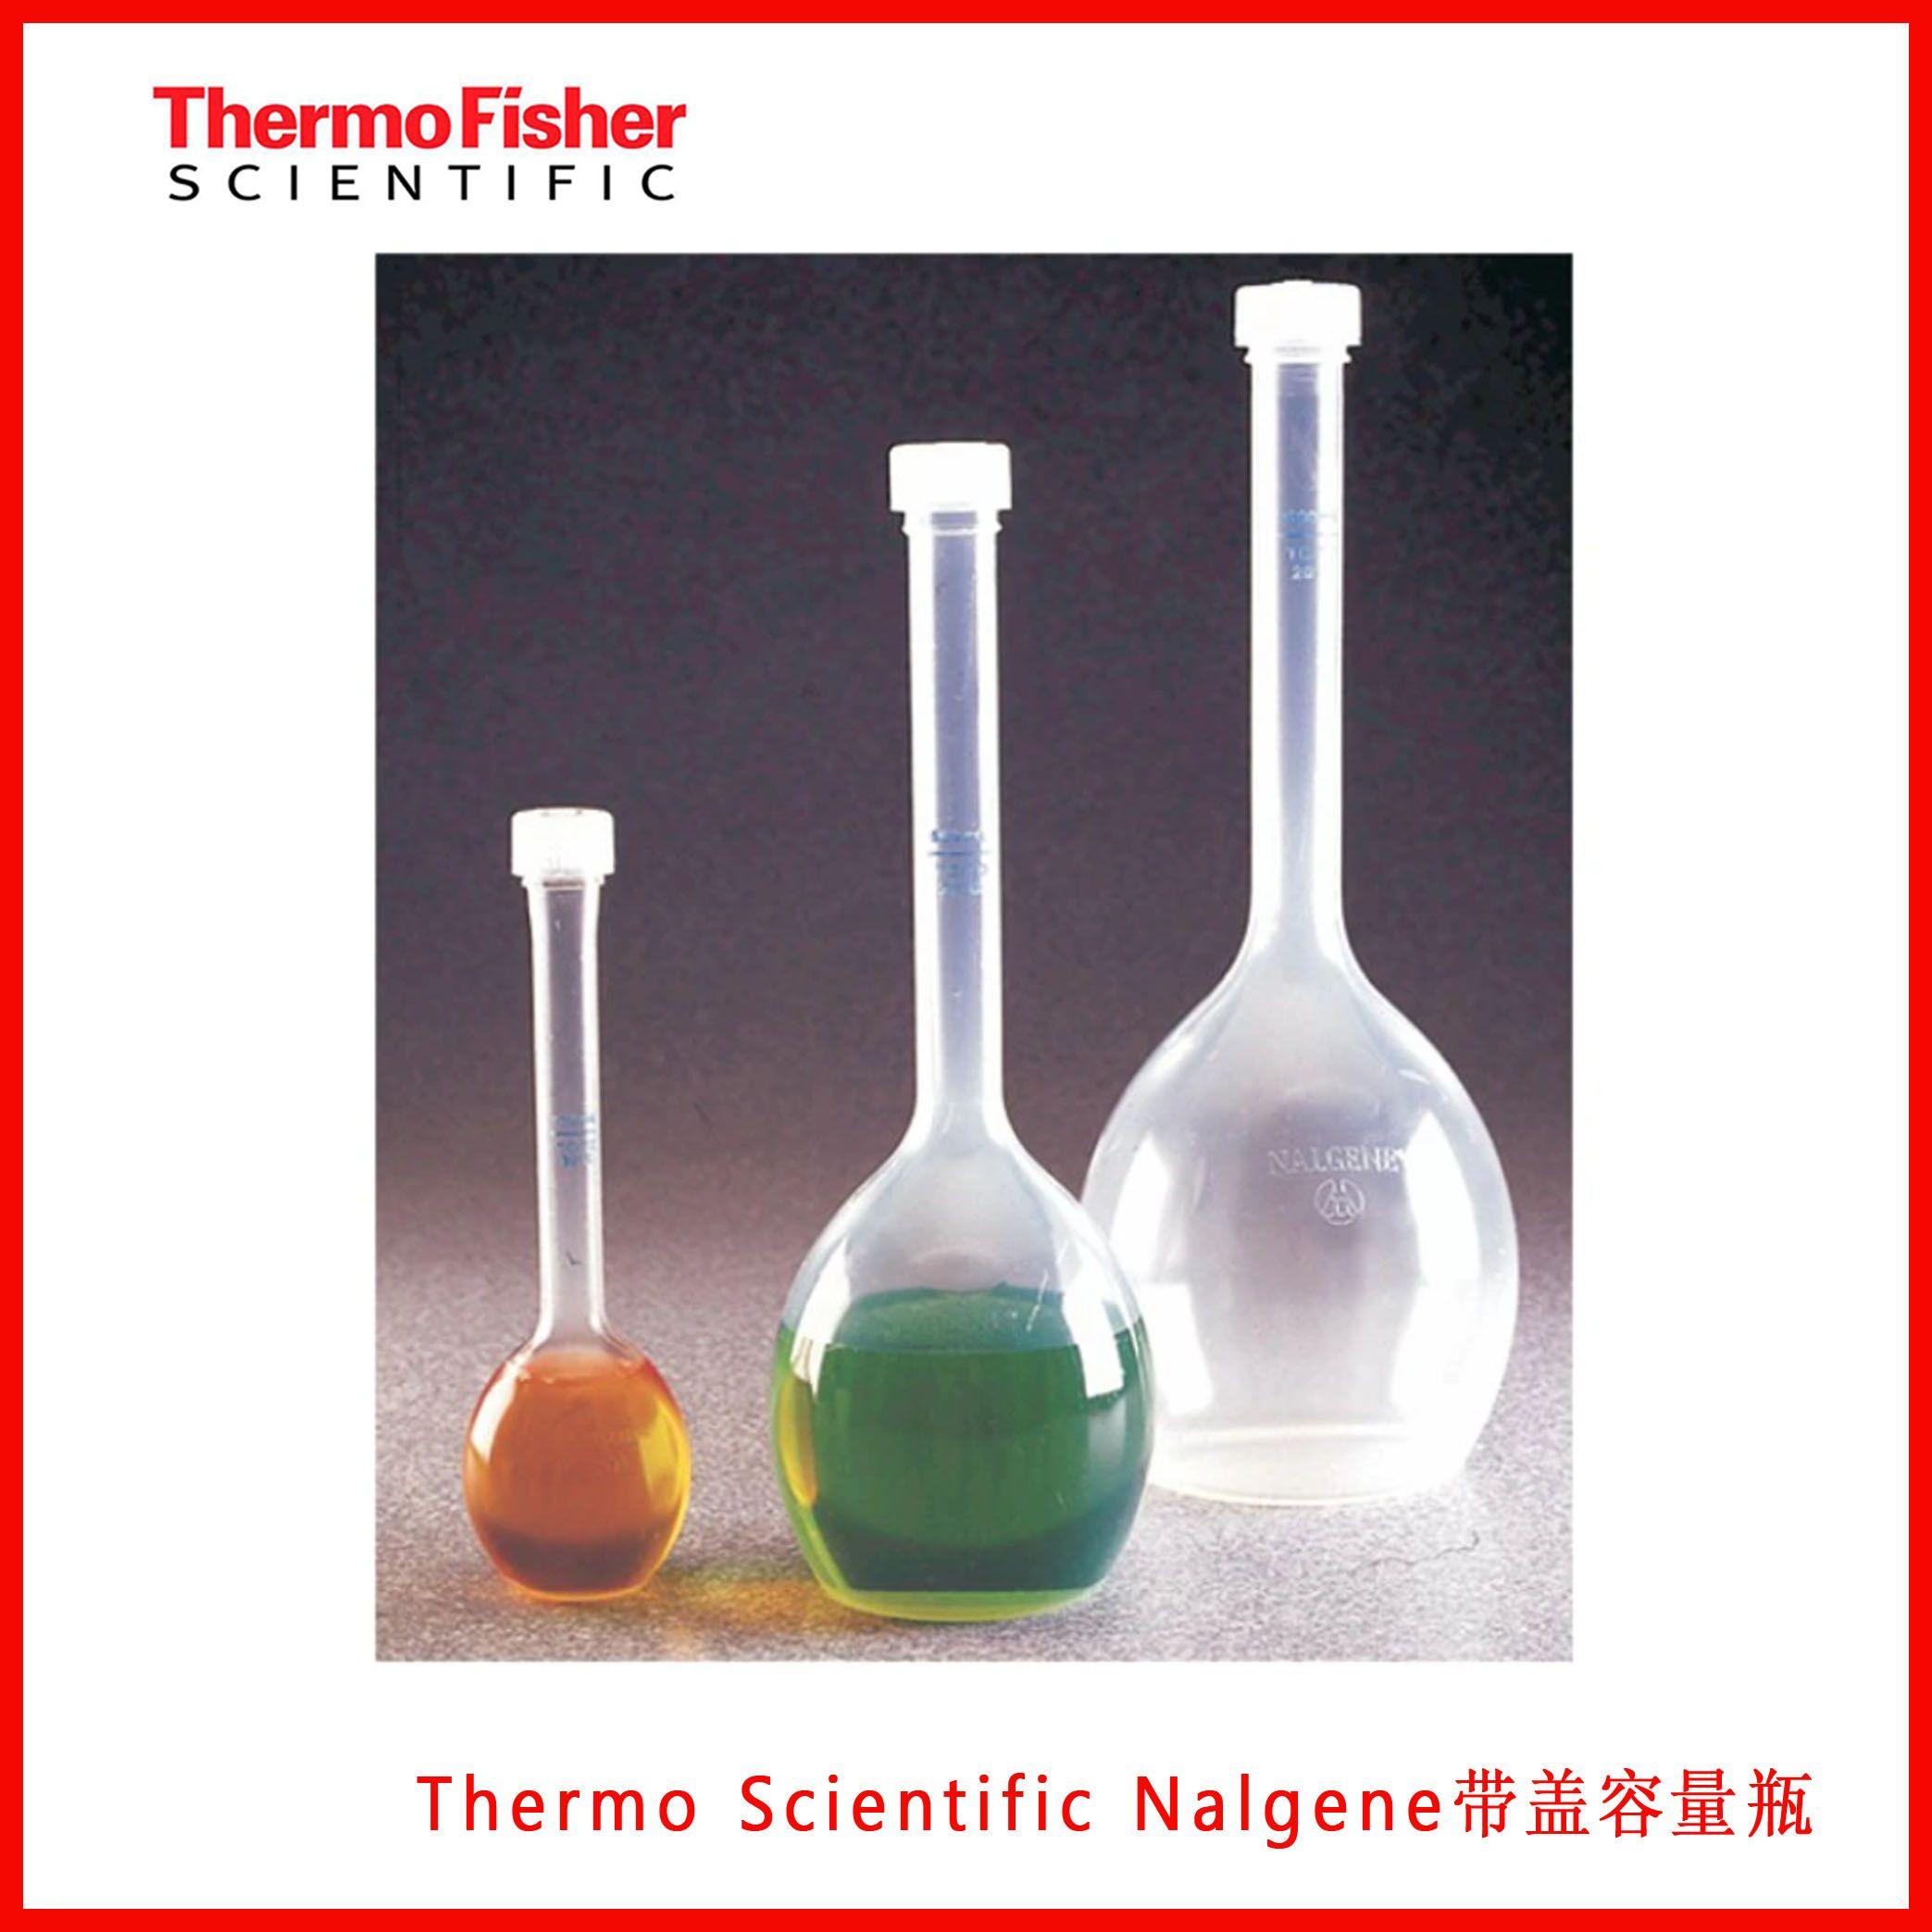 ThermoScientificNalgene B类带盖容量瓶4001-0500/ 4001-1000,现货